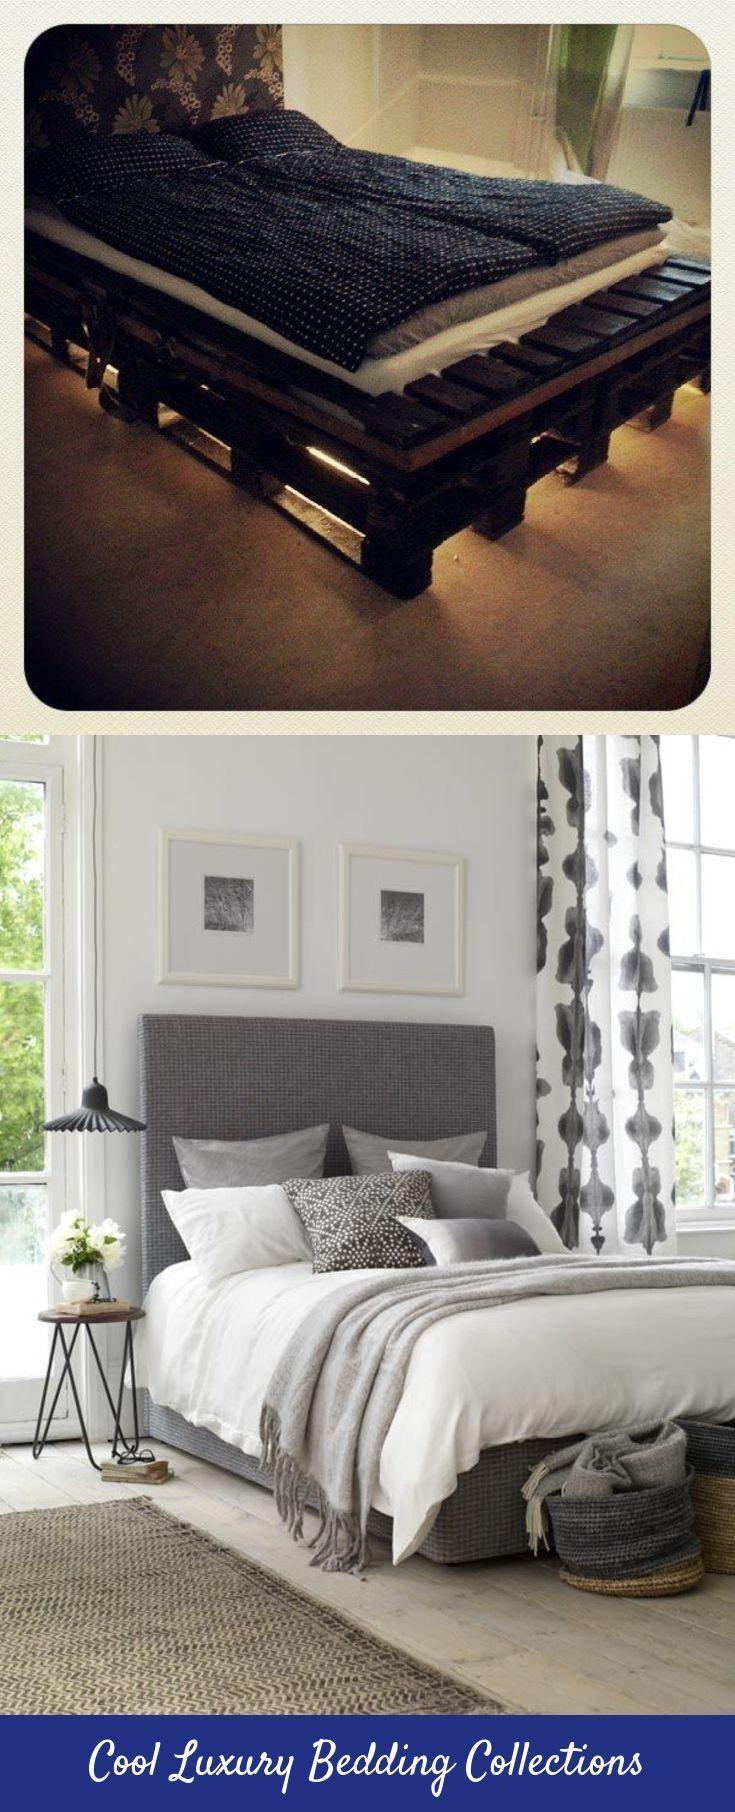 Cool Bedroom Ideas Modern Bedding in Pinterest Bed